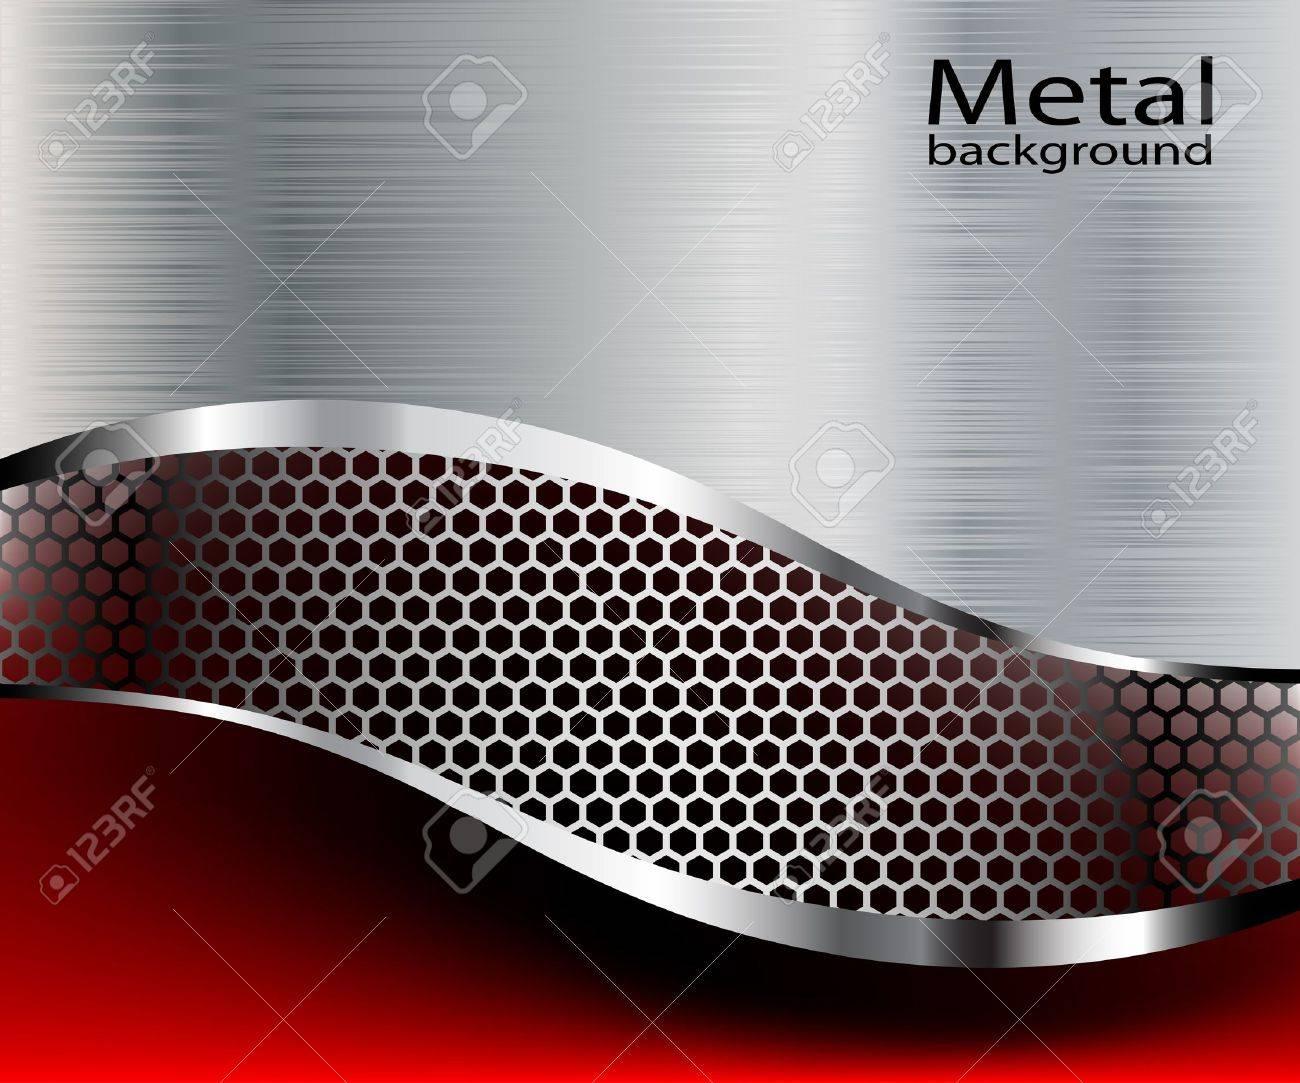 Illustration metallic backgrounds. Stock Vector - 10420405